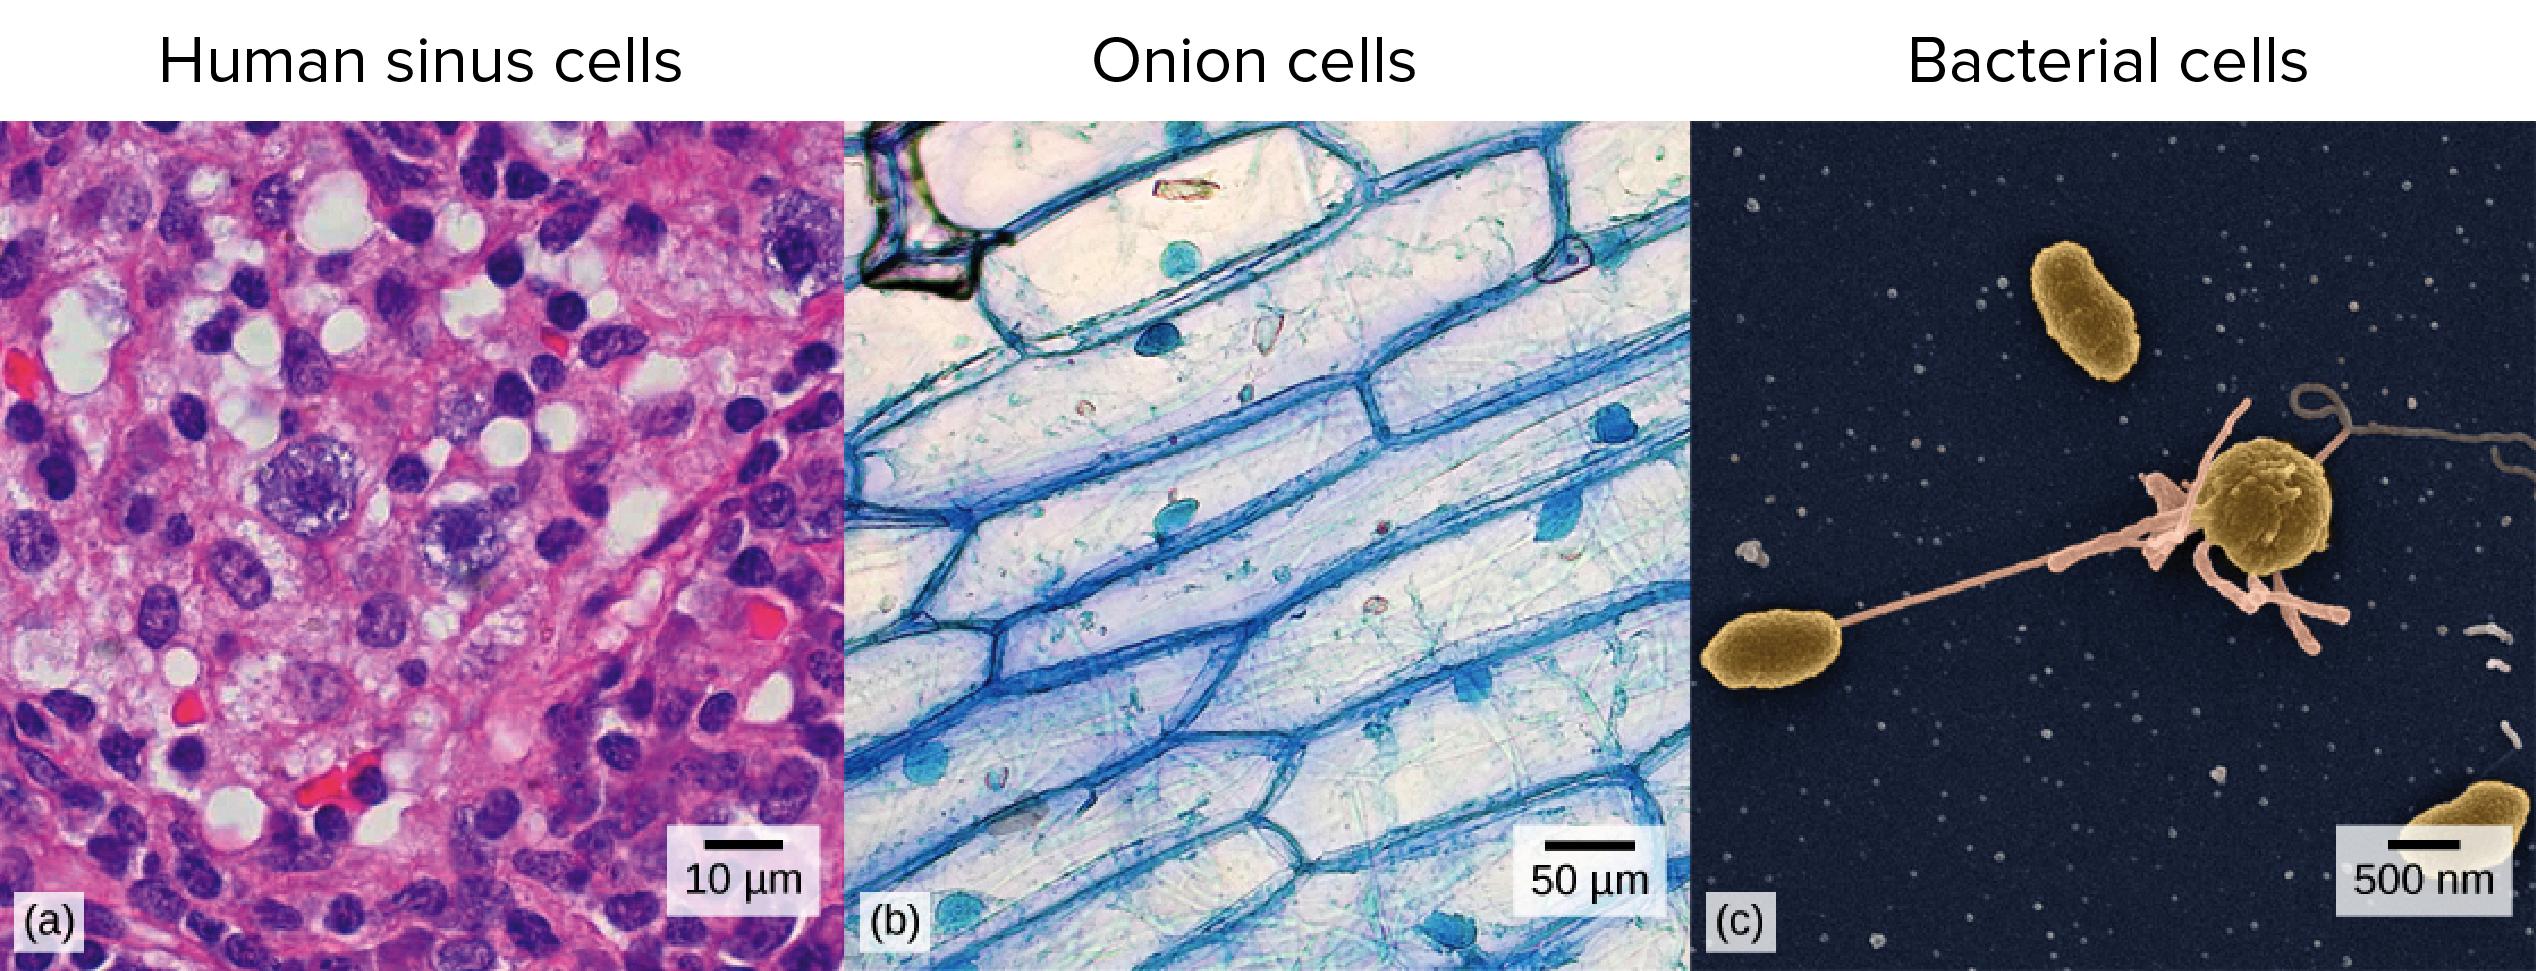 Eukaryotic animal cell microscope